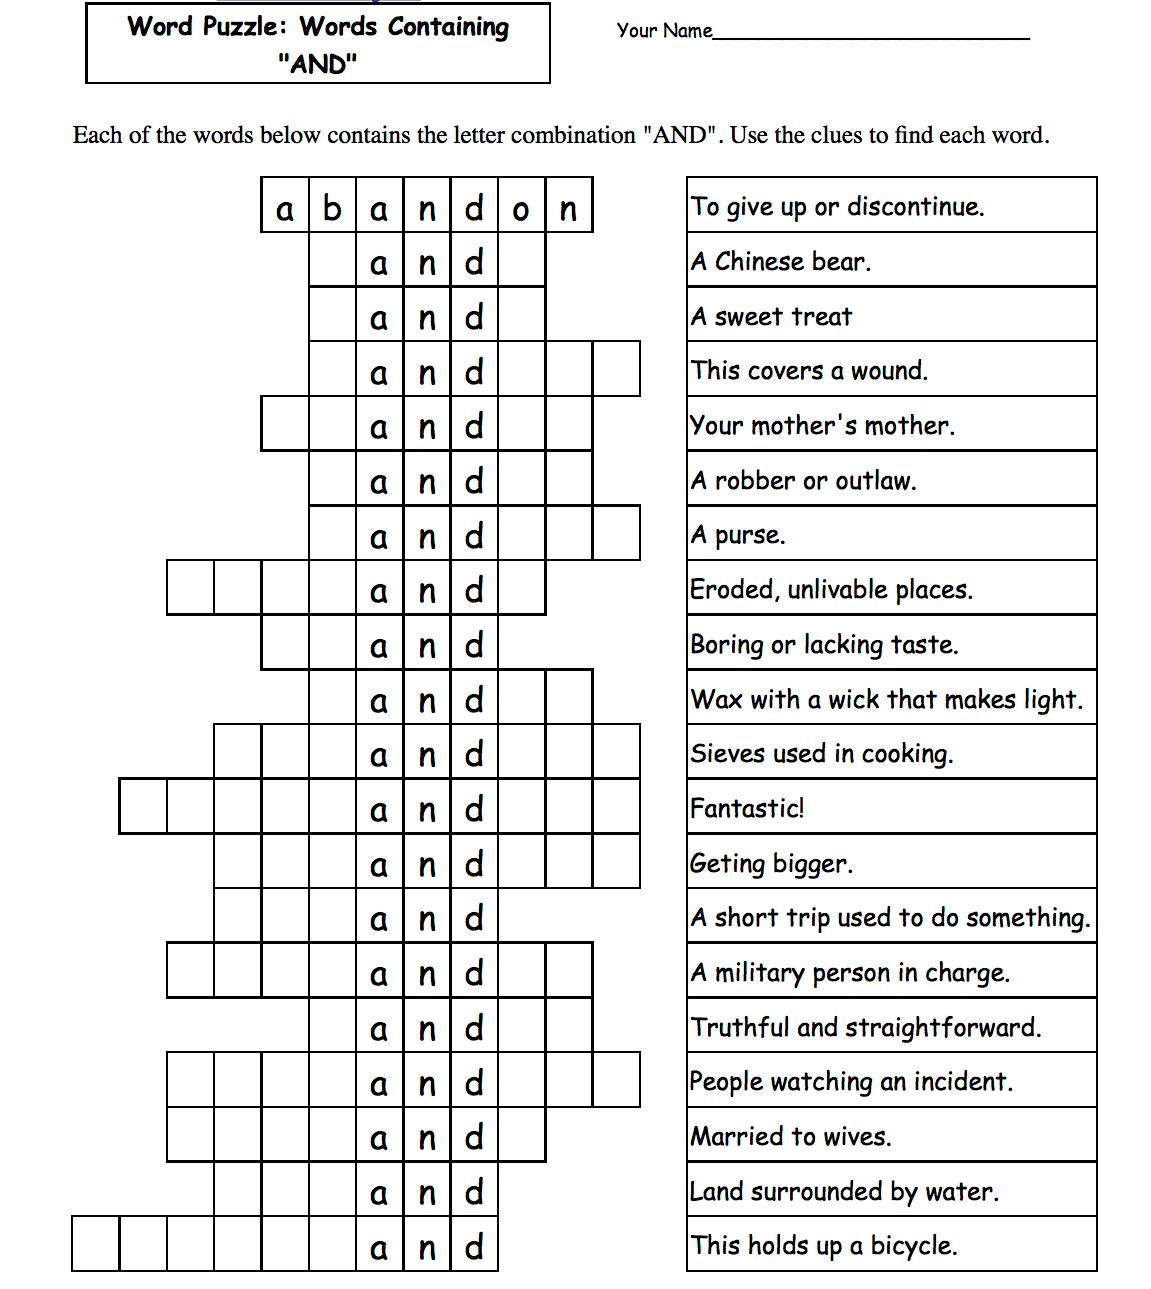 Kitchen Gadget Crossword Clue 10 Letters